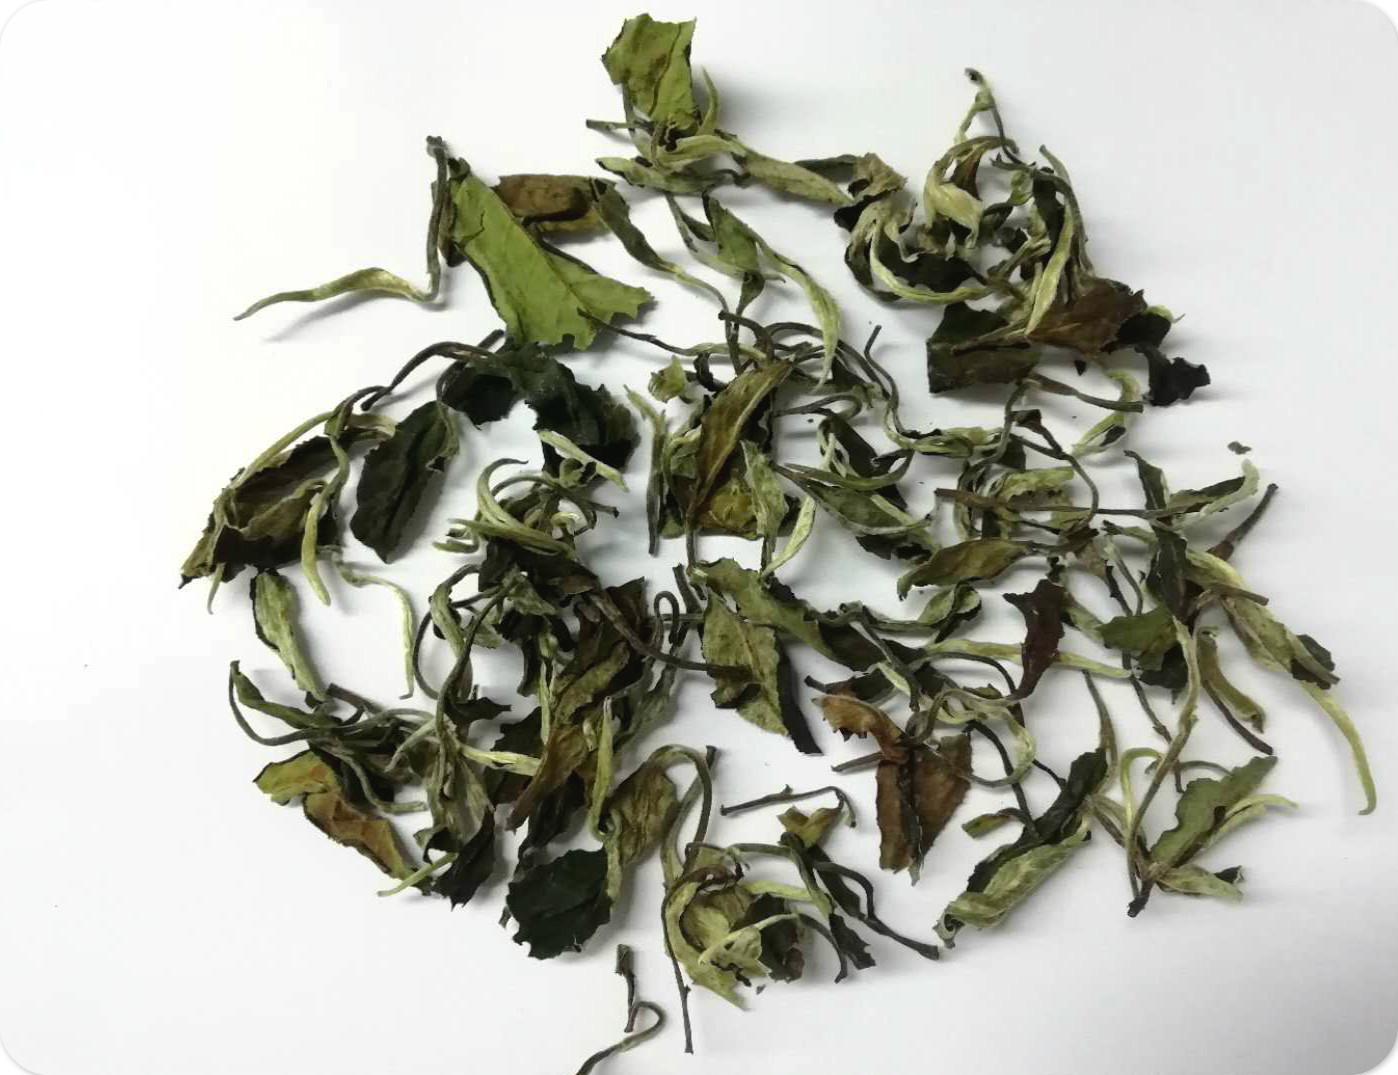 Yunnan Moonlight White tea chinese high quality organic tea - 4uTea | 4uTea.com